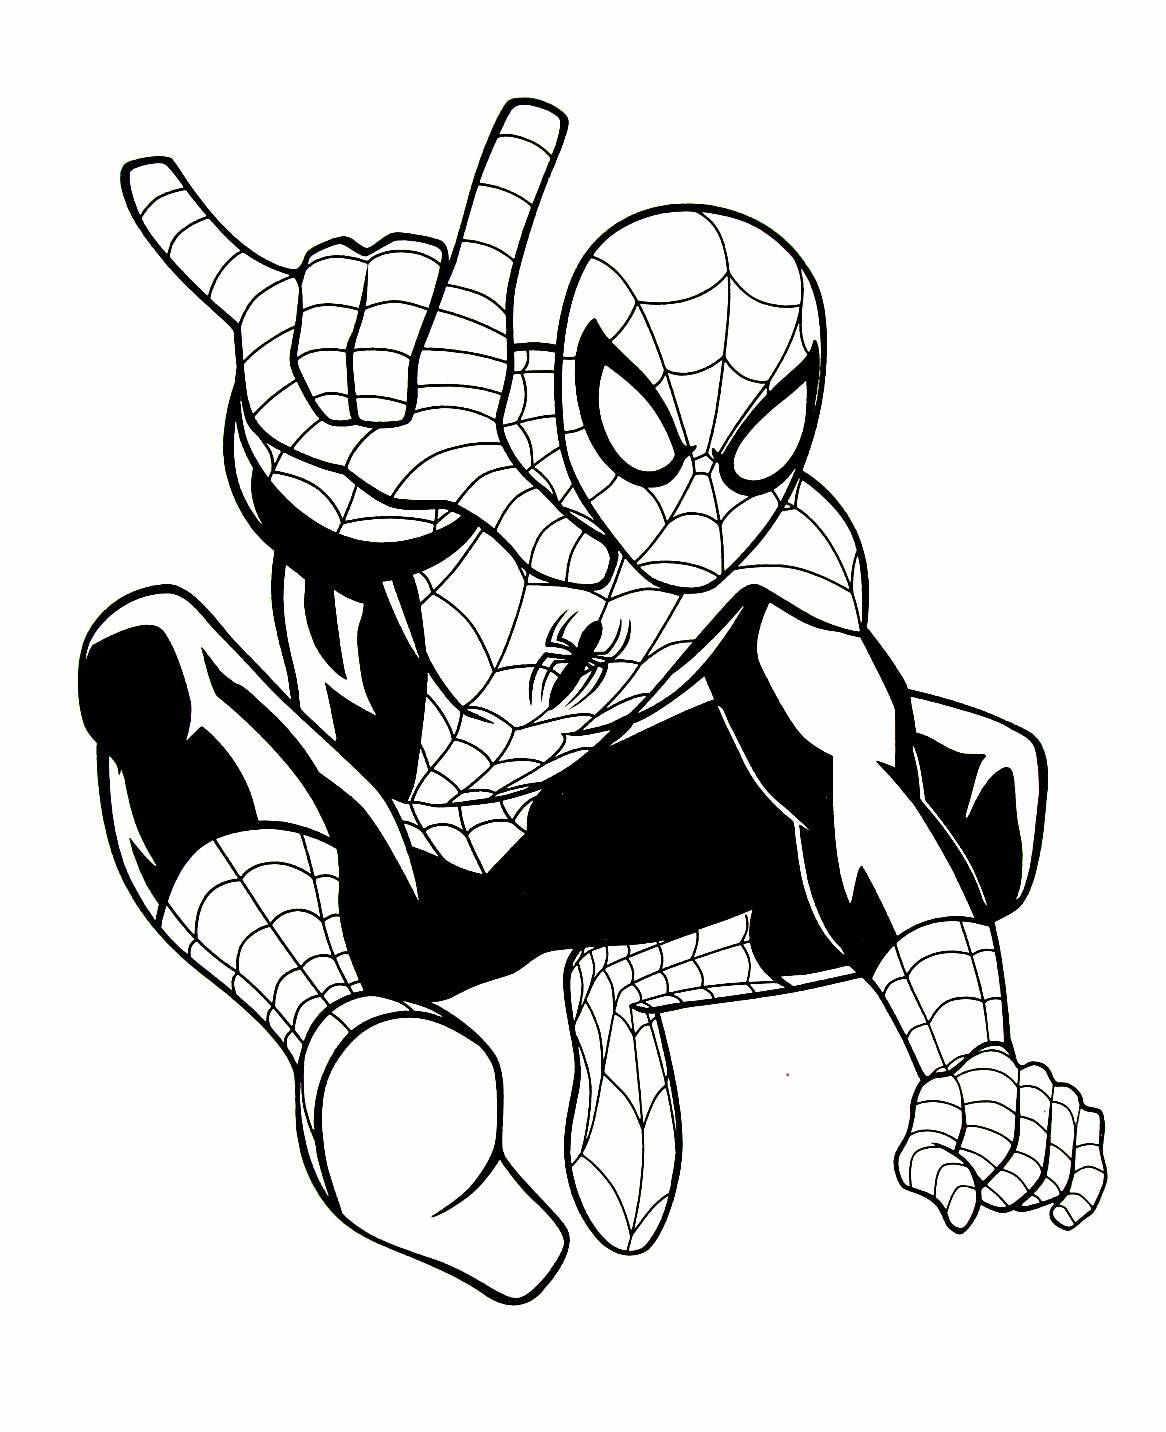 Spiderman Coloring Book Page Spiderman Coloring Superhero Coloring Marvel Coloring